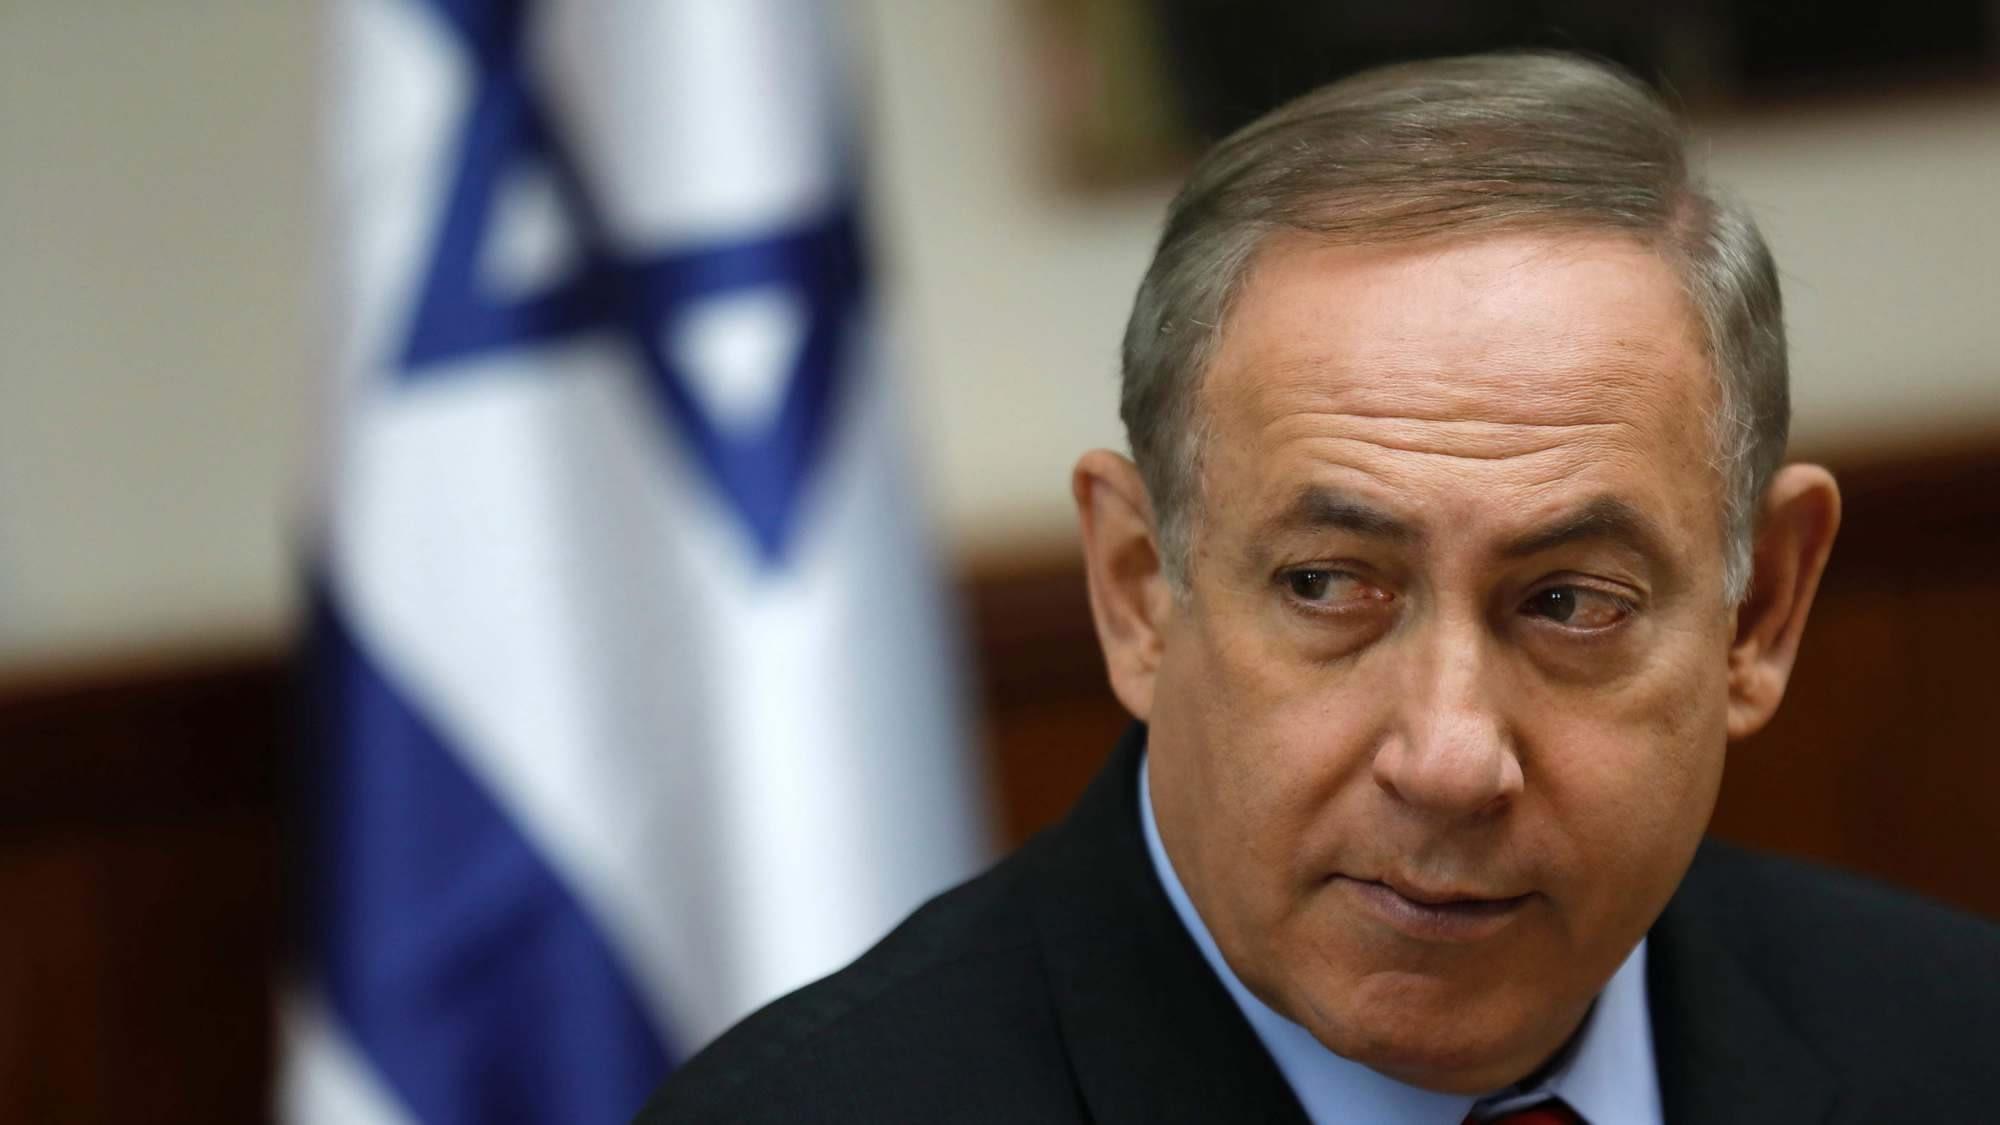 Netanyahu says prepares for direct flights between Israel, UAE after peace deal